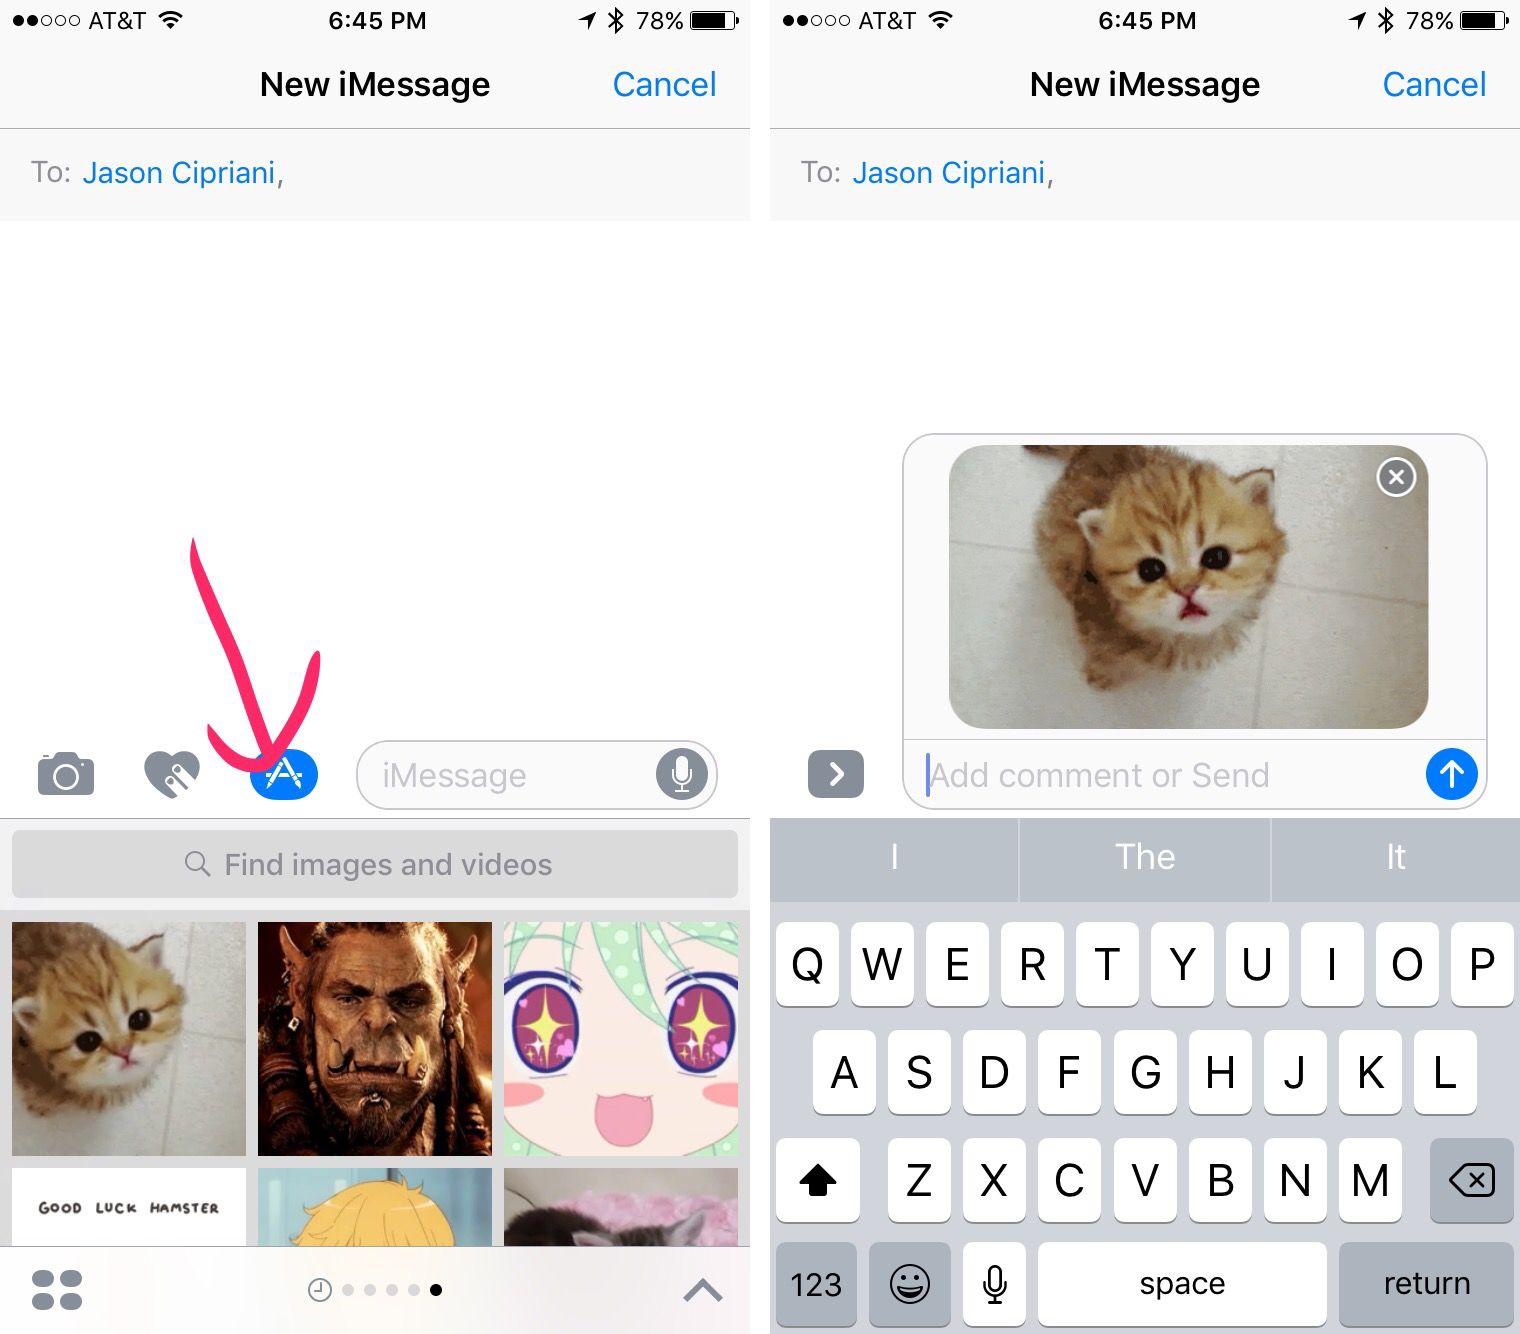 iOS 10 메시지 앱의 이미지 검색 기능. (CNET)